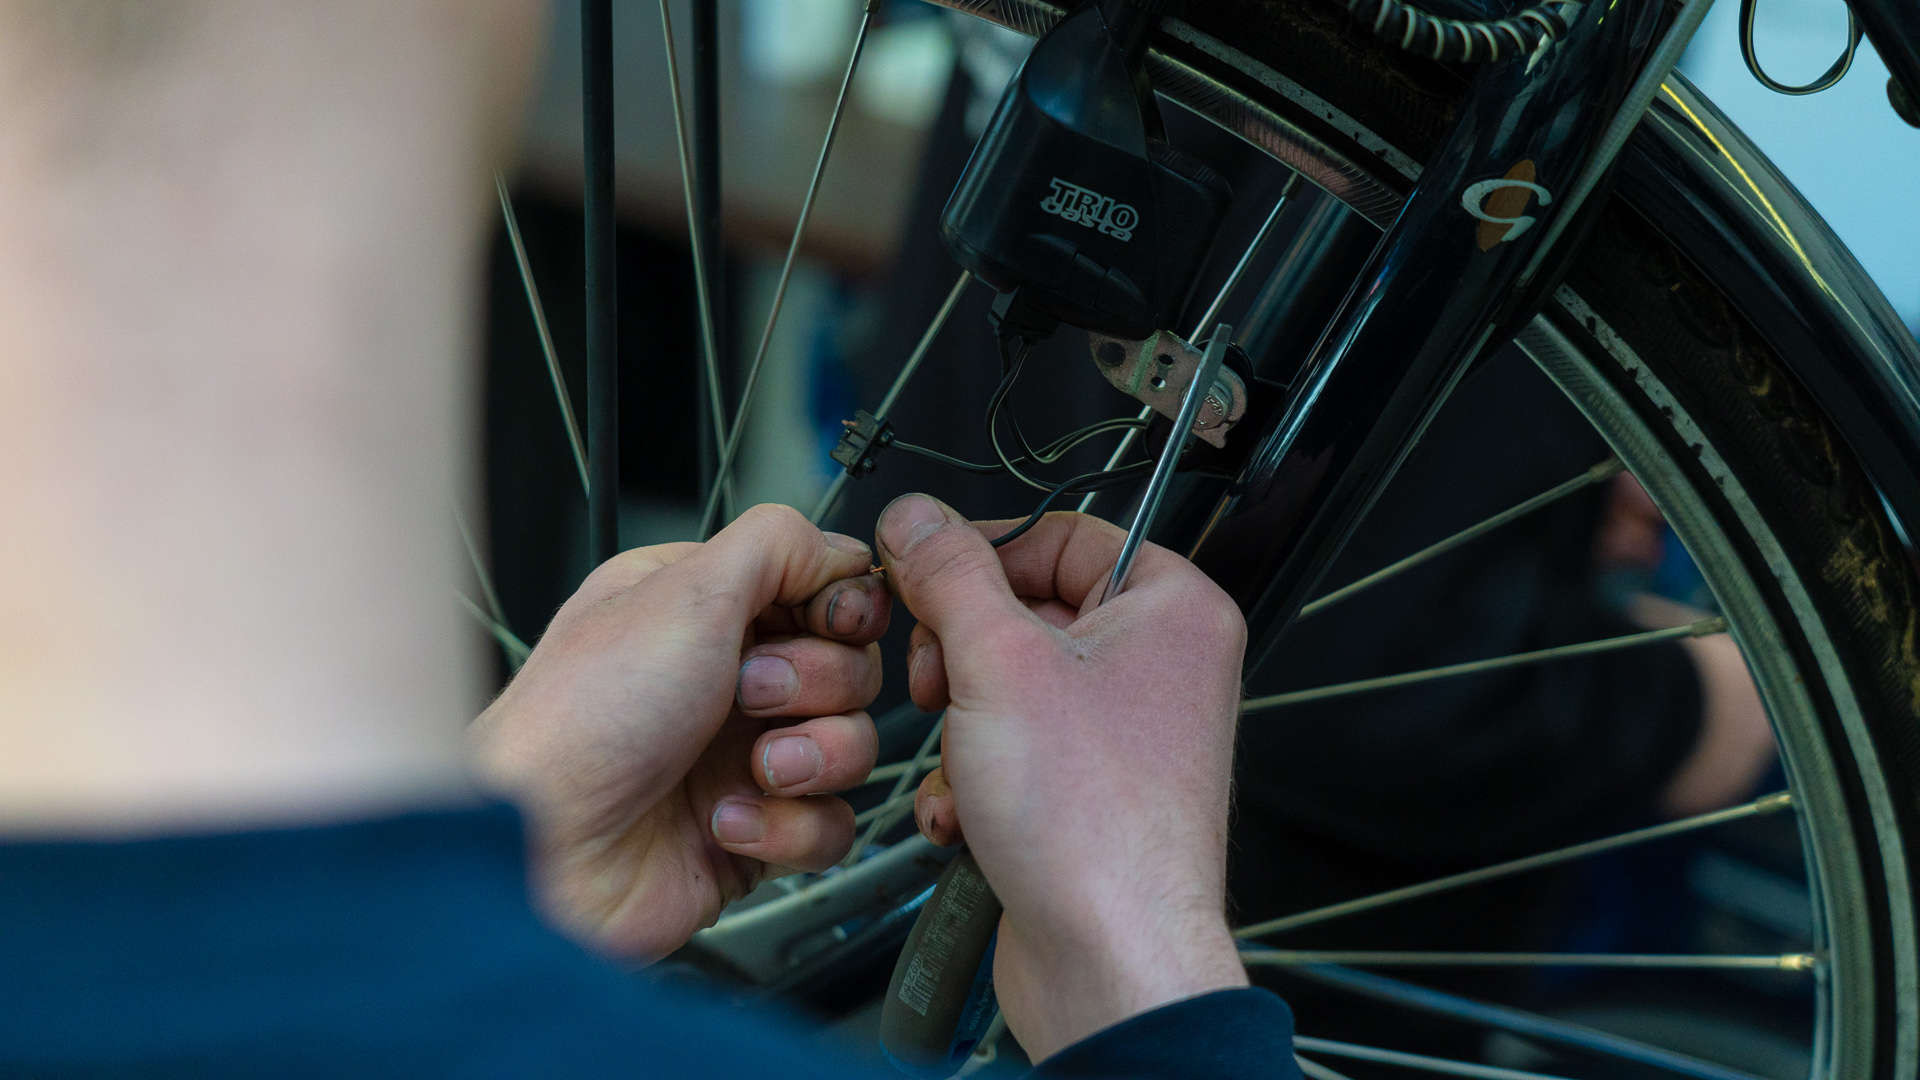 Fahrradzentrum Grauthoff Fotoshooting 51